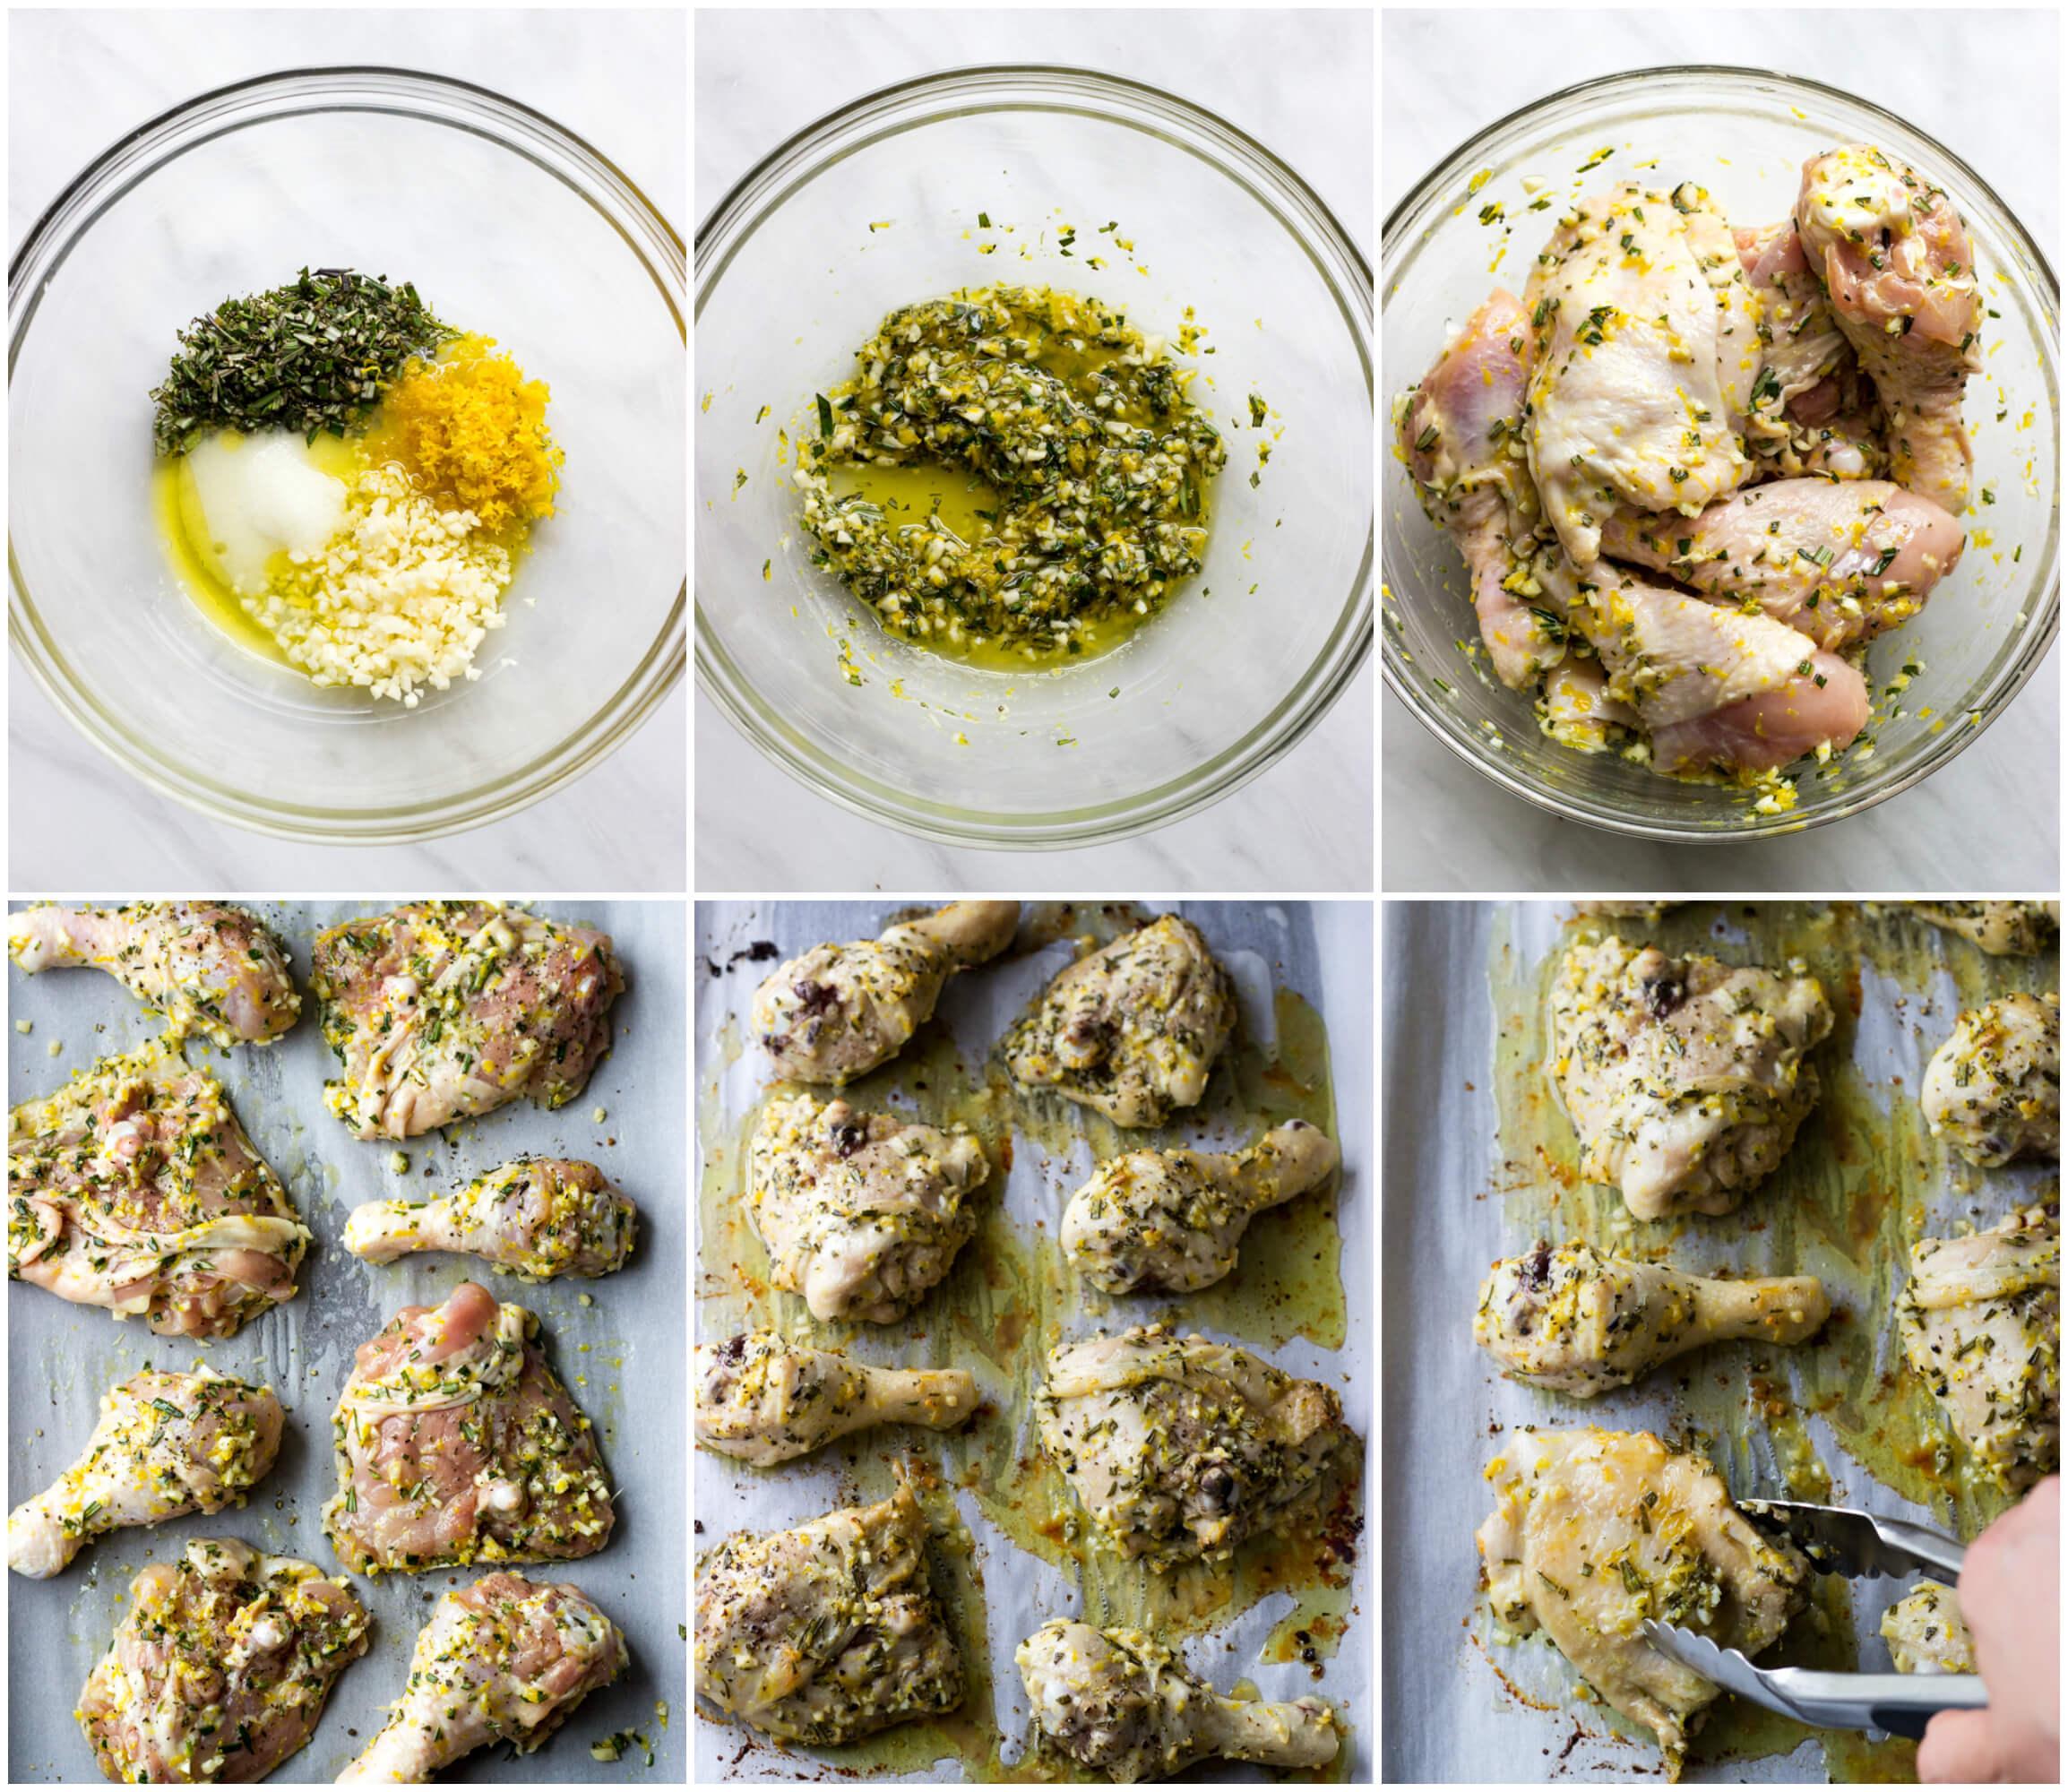 Roasted Lemon Rosemary Chicken - the best tasting oven baked chicken with few simple ingredients | littlebroken.com @littlebroken